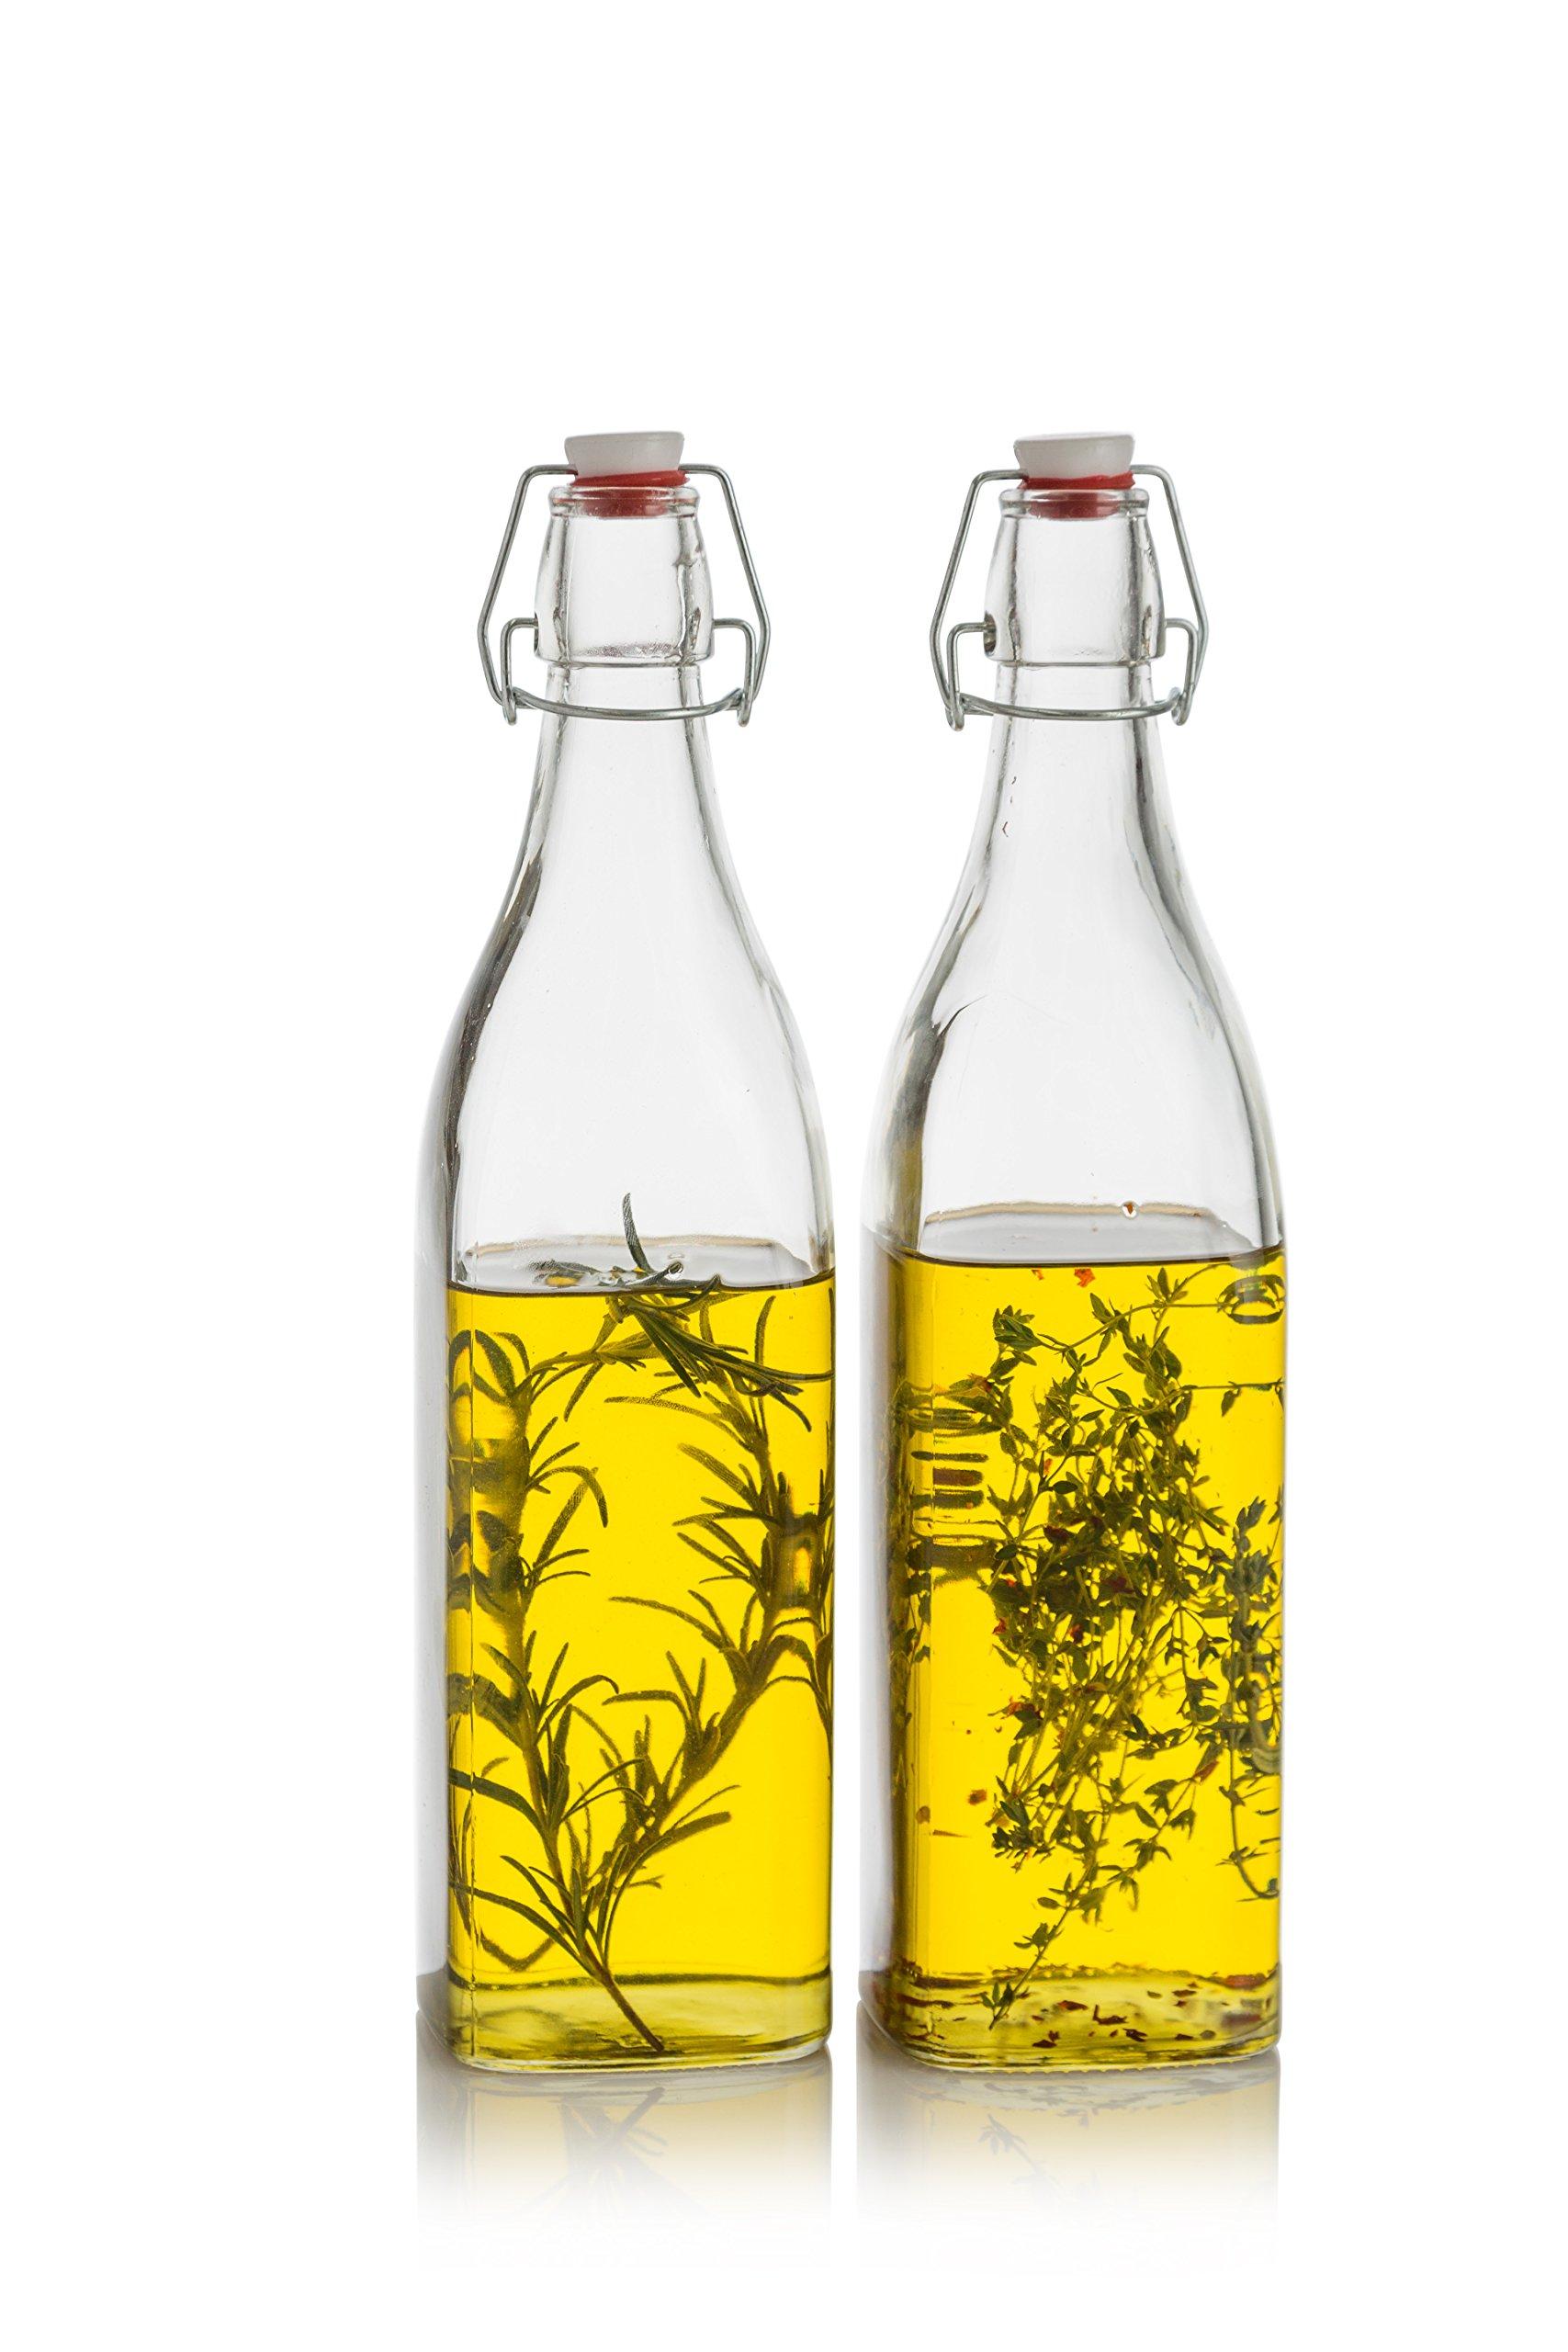 Klikel Conway Square Glass Water Bottles - Swing Top Clear Glass Multi-purpose Bottles 1 Liter (33.8oz), Set of 2